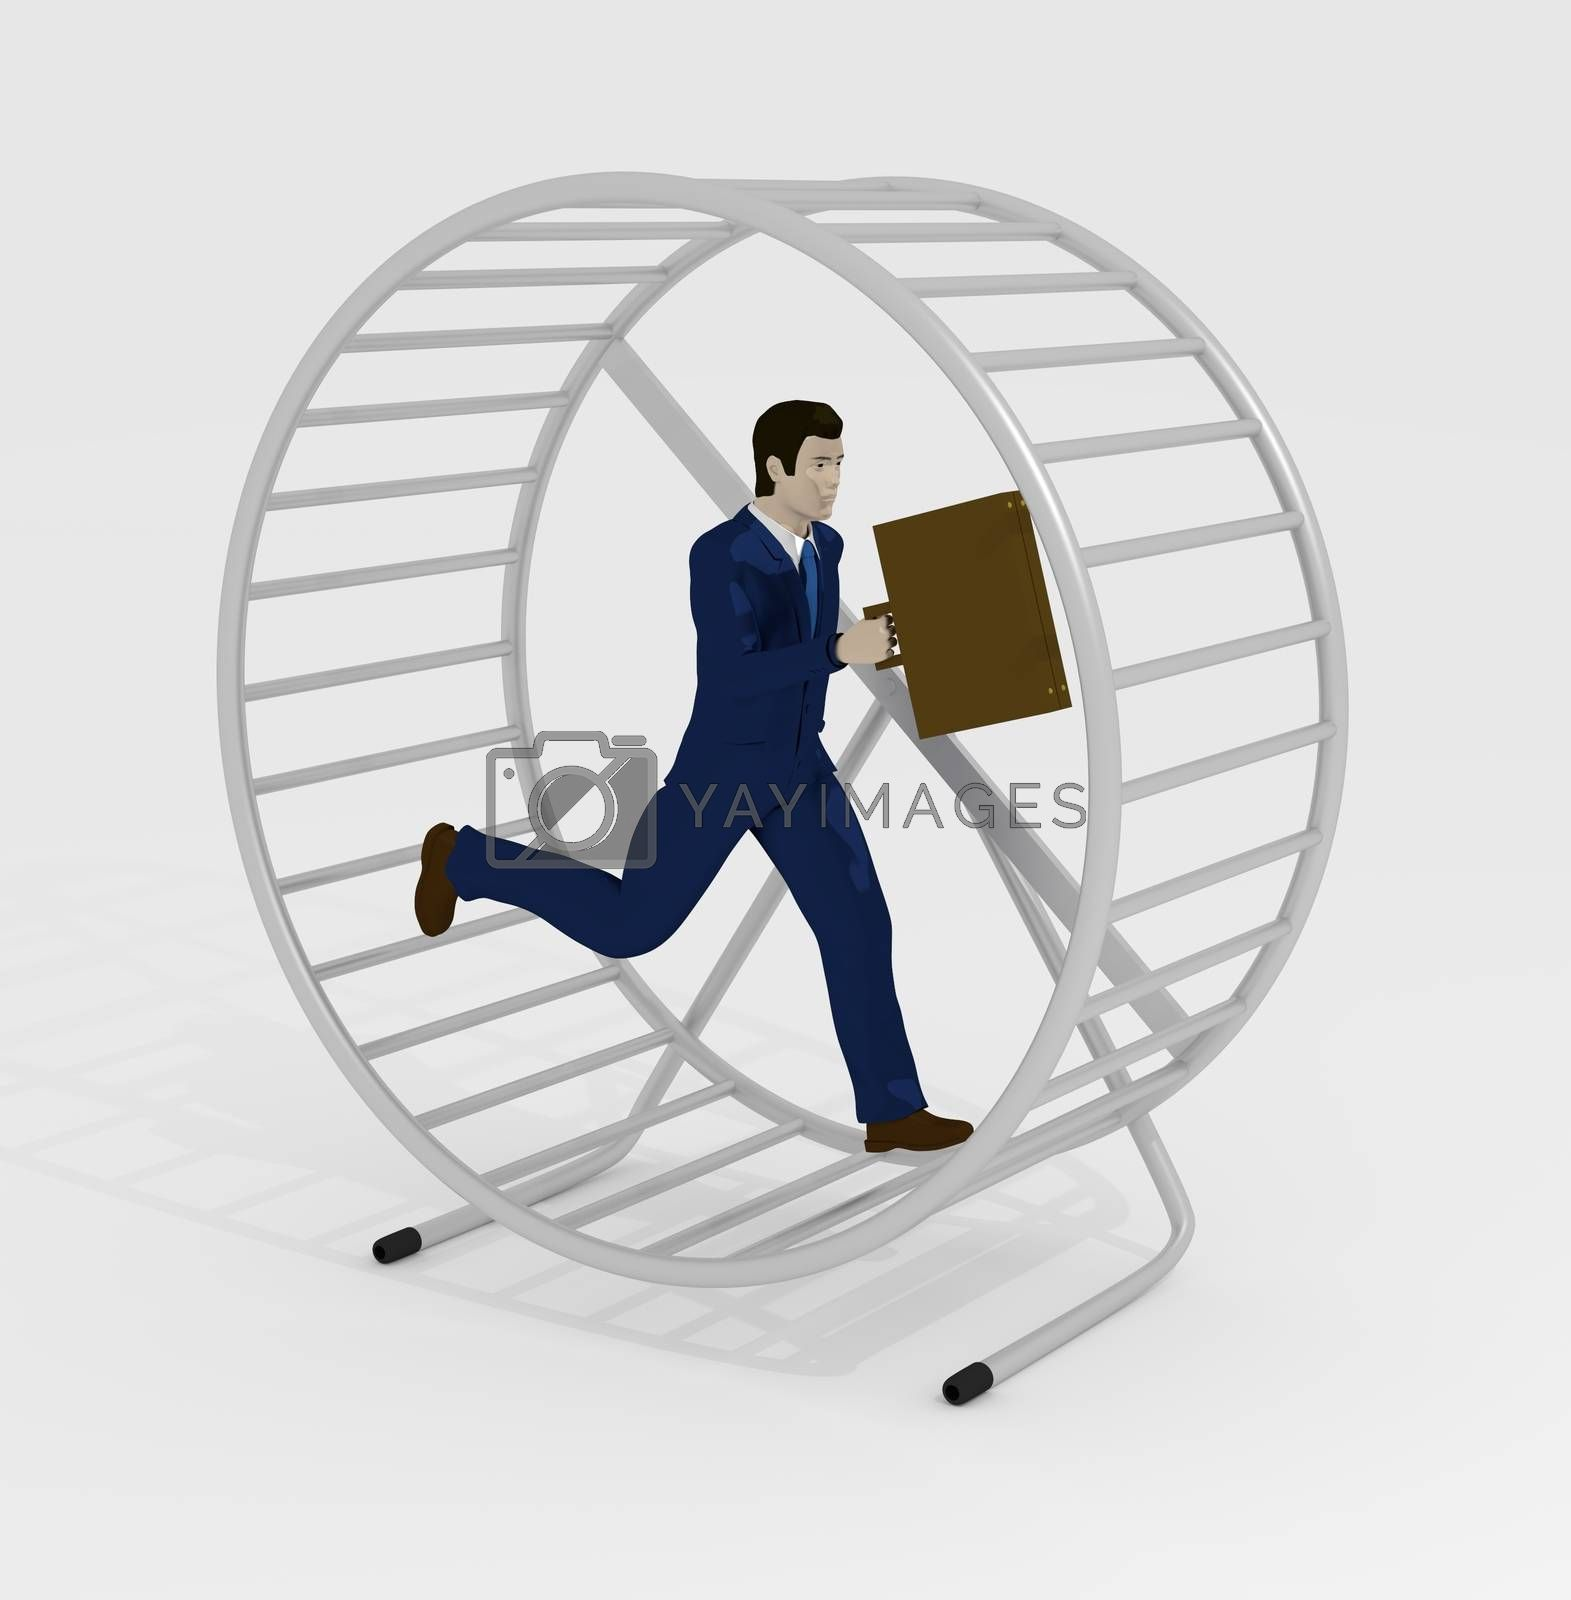 Illustration of a businessman running inside a hamster wheel